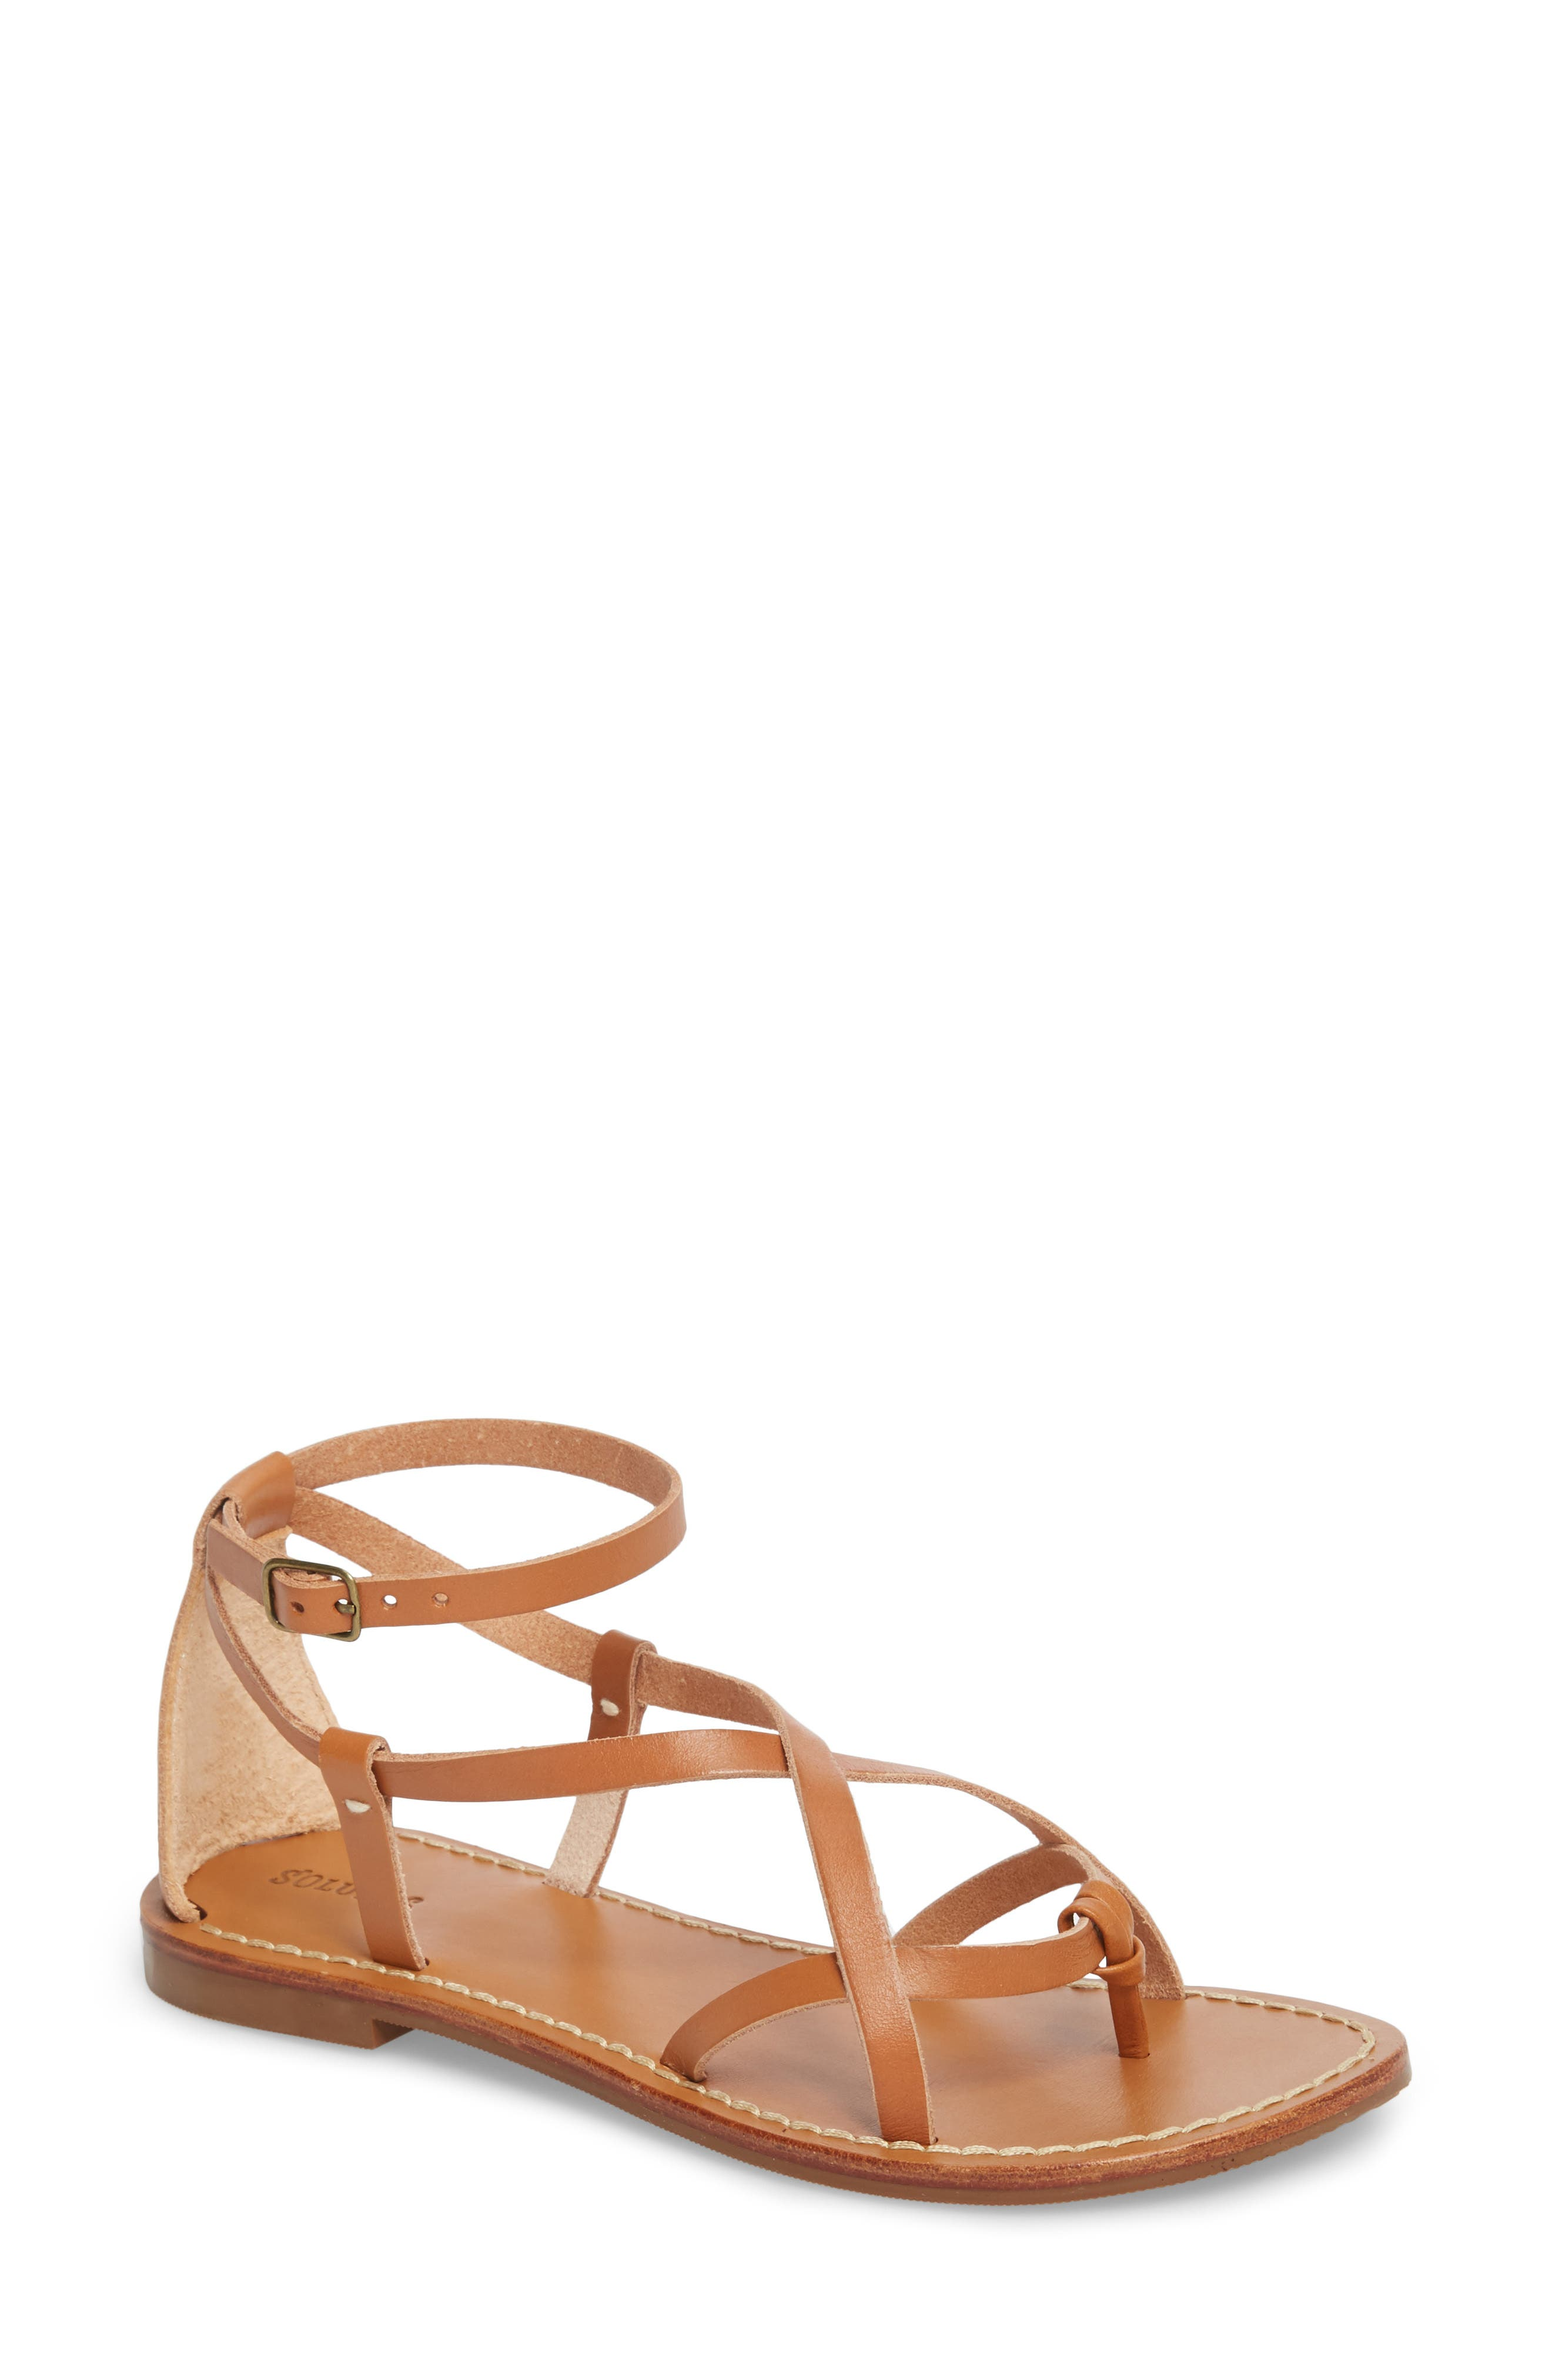 Amalfi Strappy Sandal,                         Main,                         color, Nude